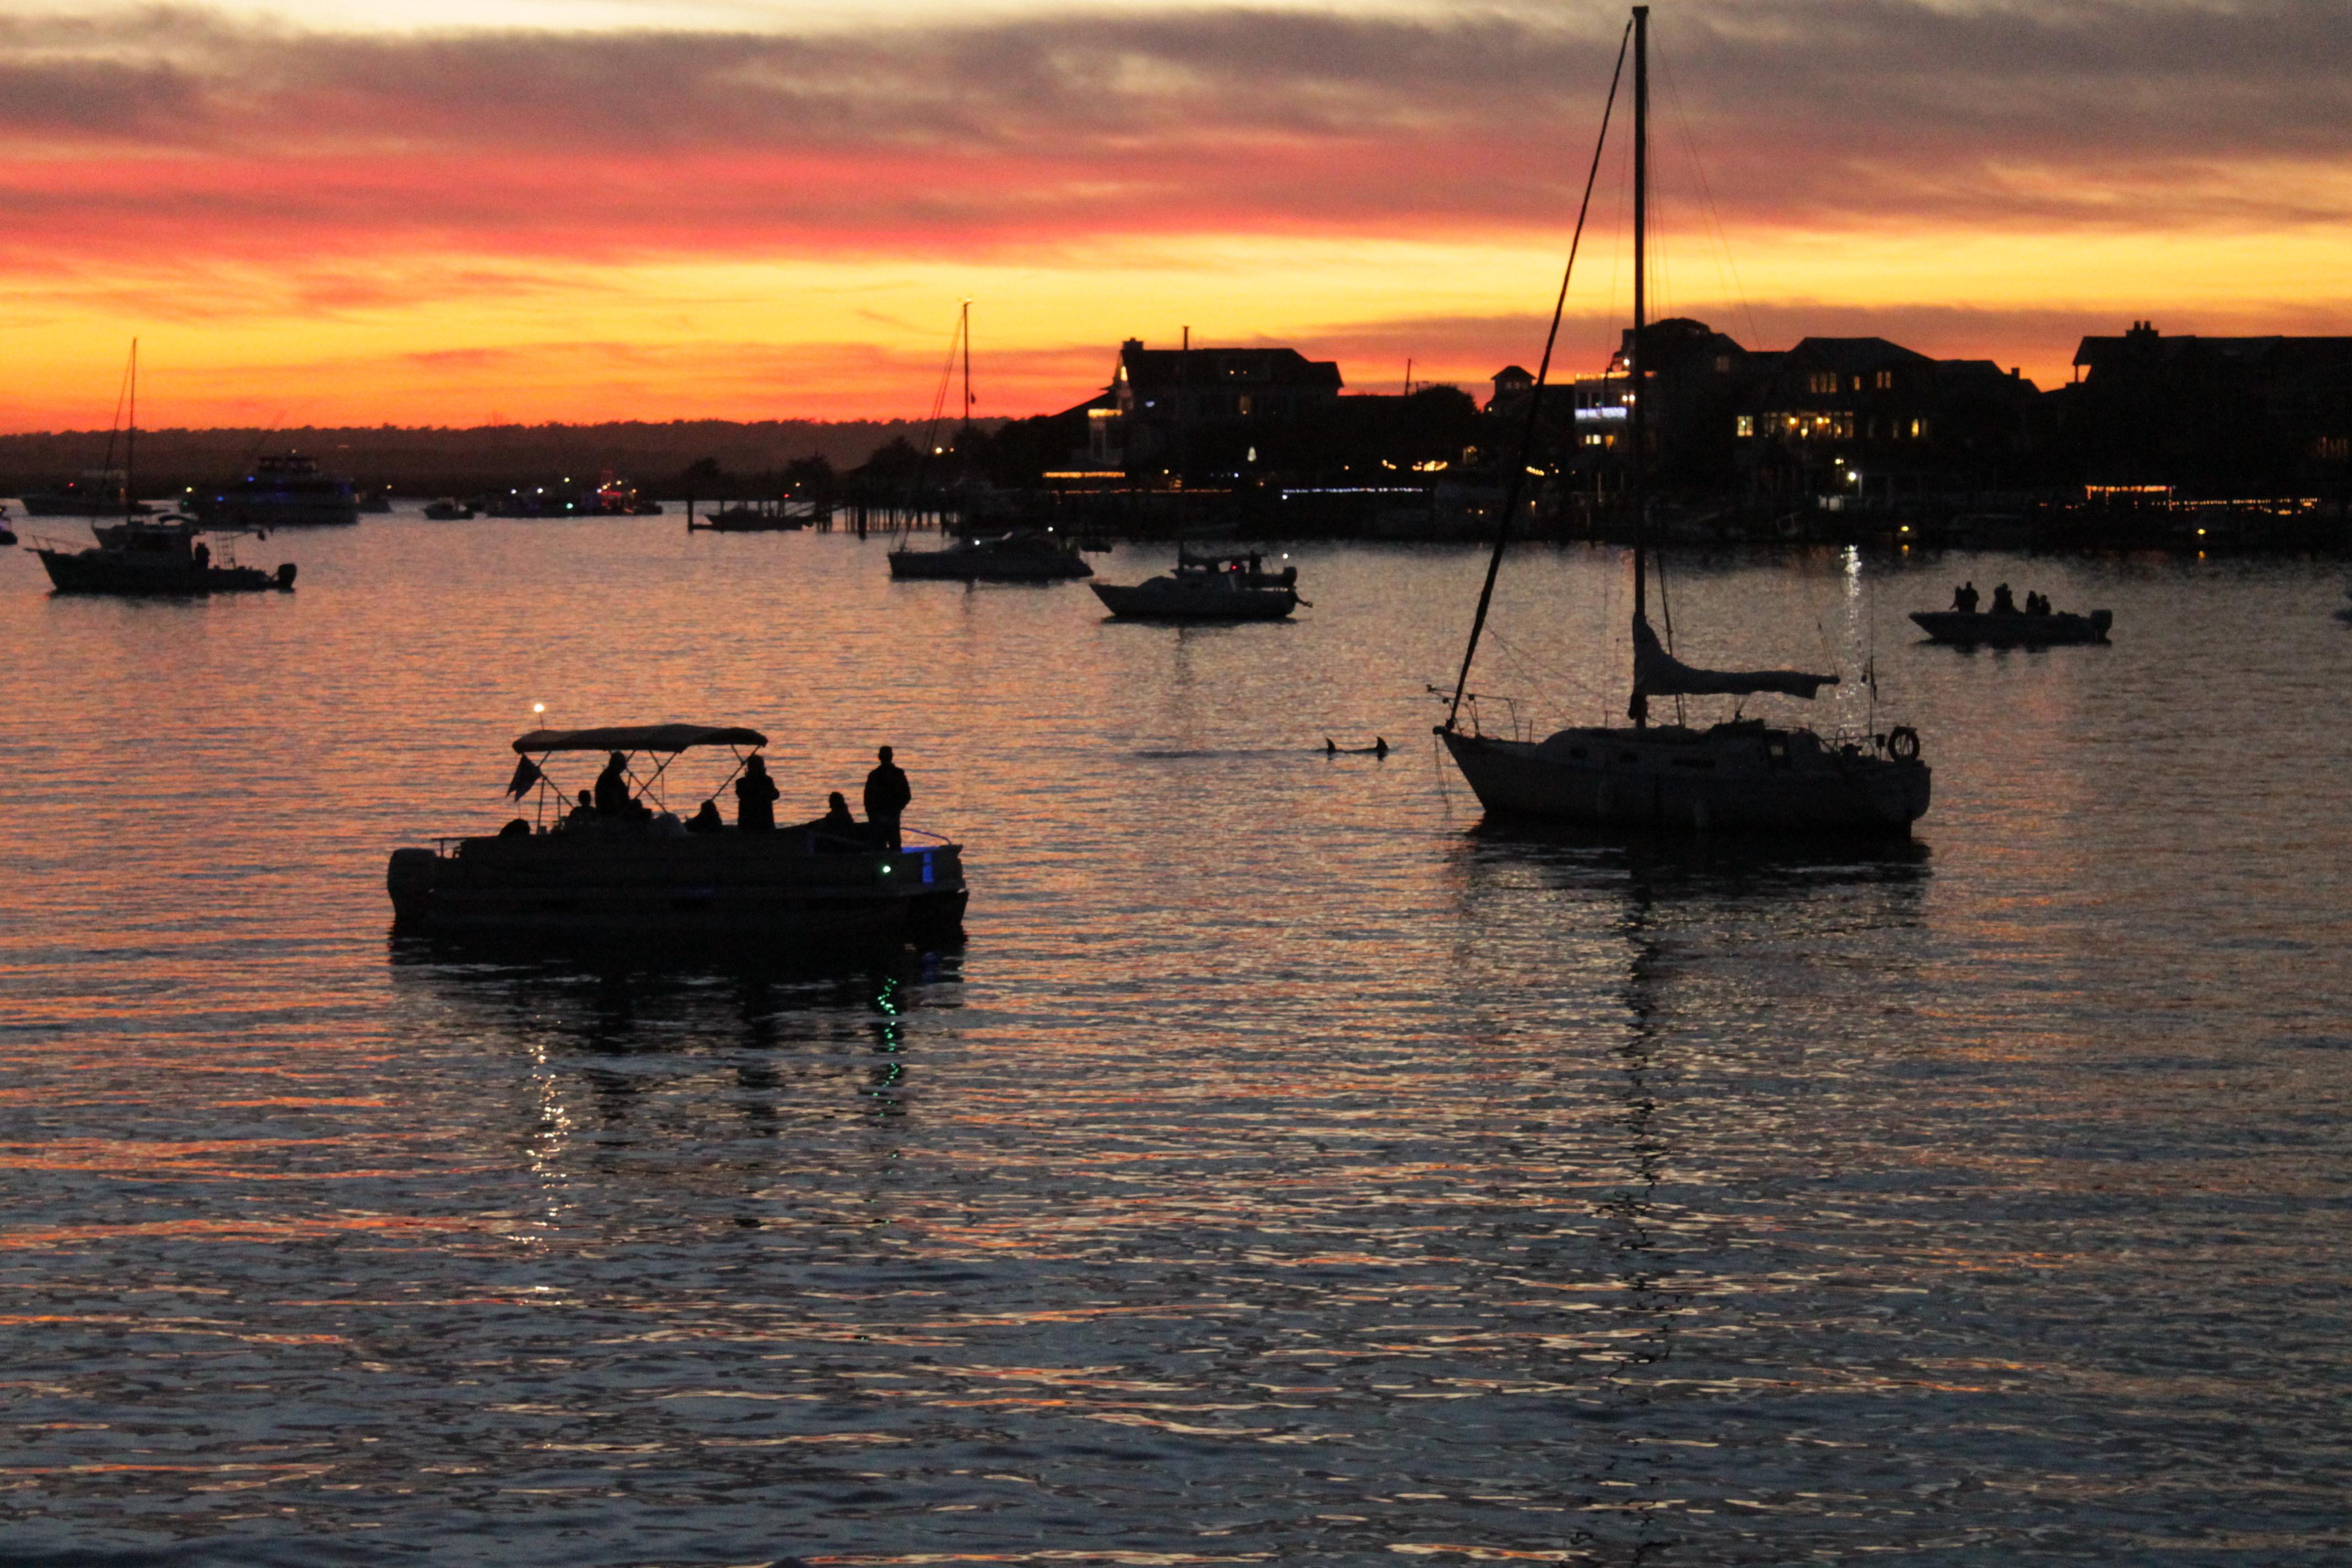 WB sunset 2